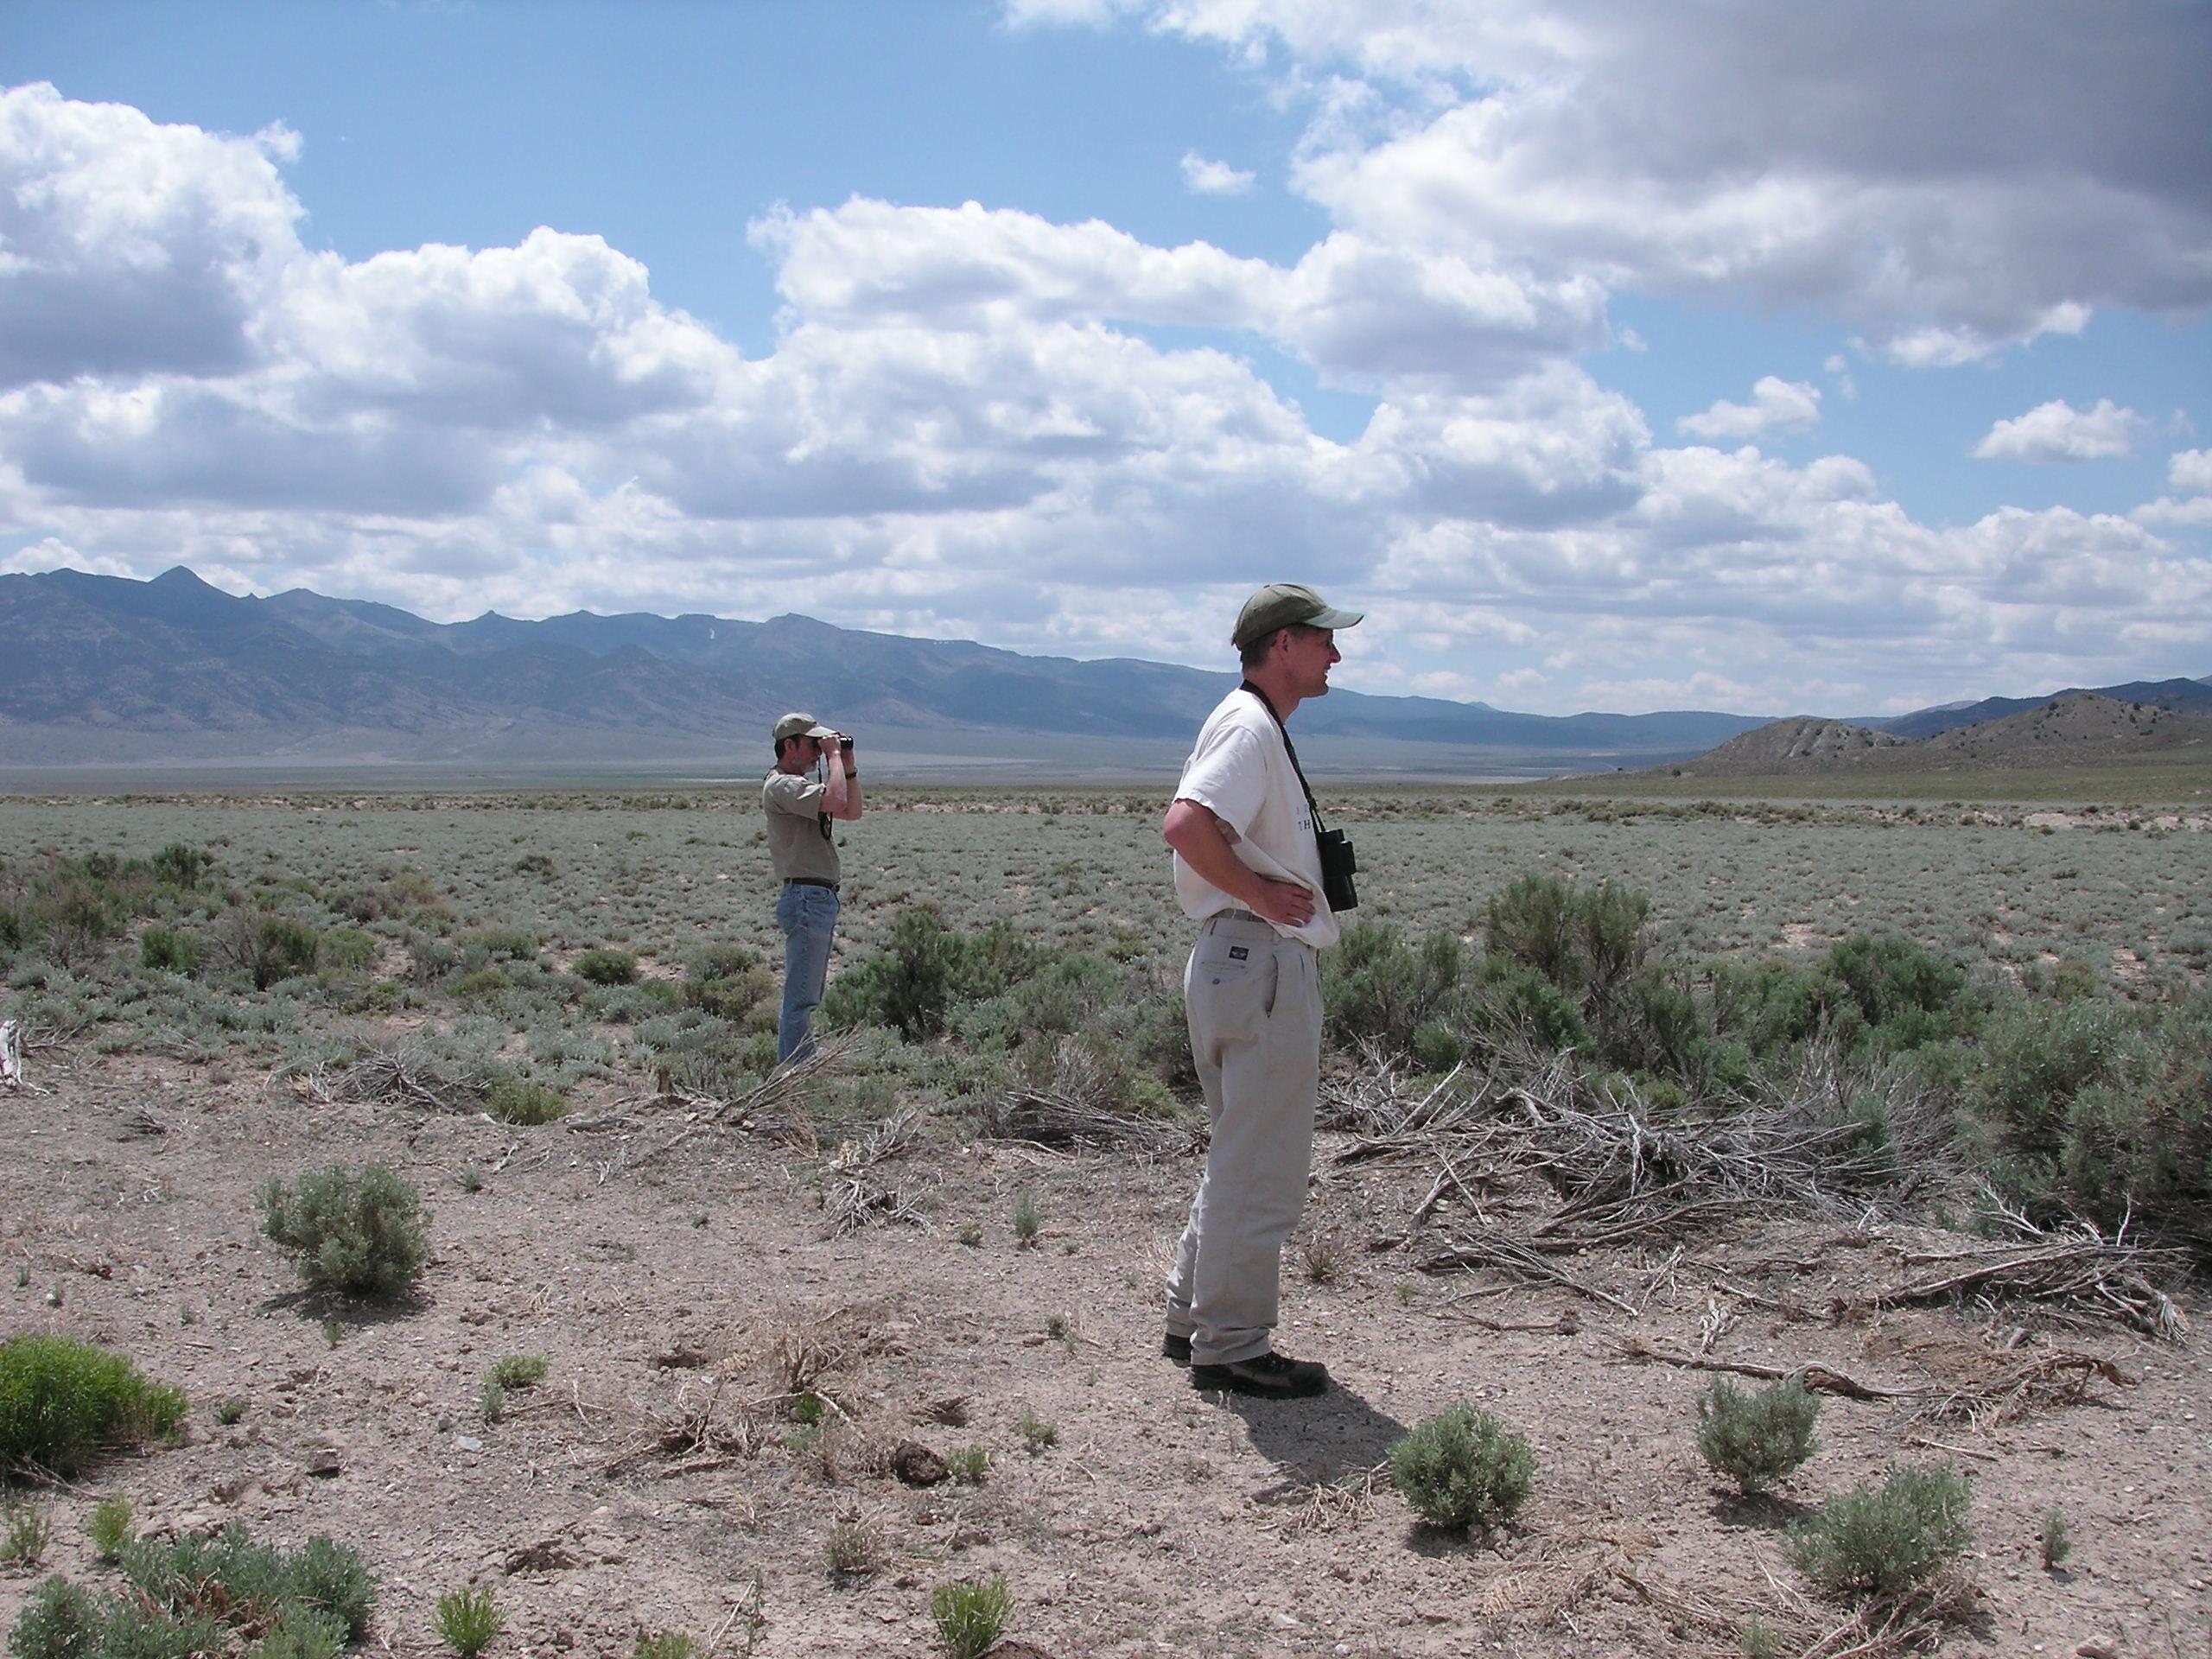 Antelope Valley, Eureke County, Nevada - Credit: Erica Fleishman